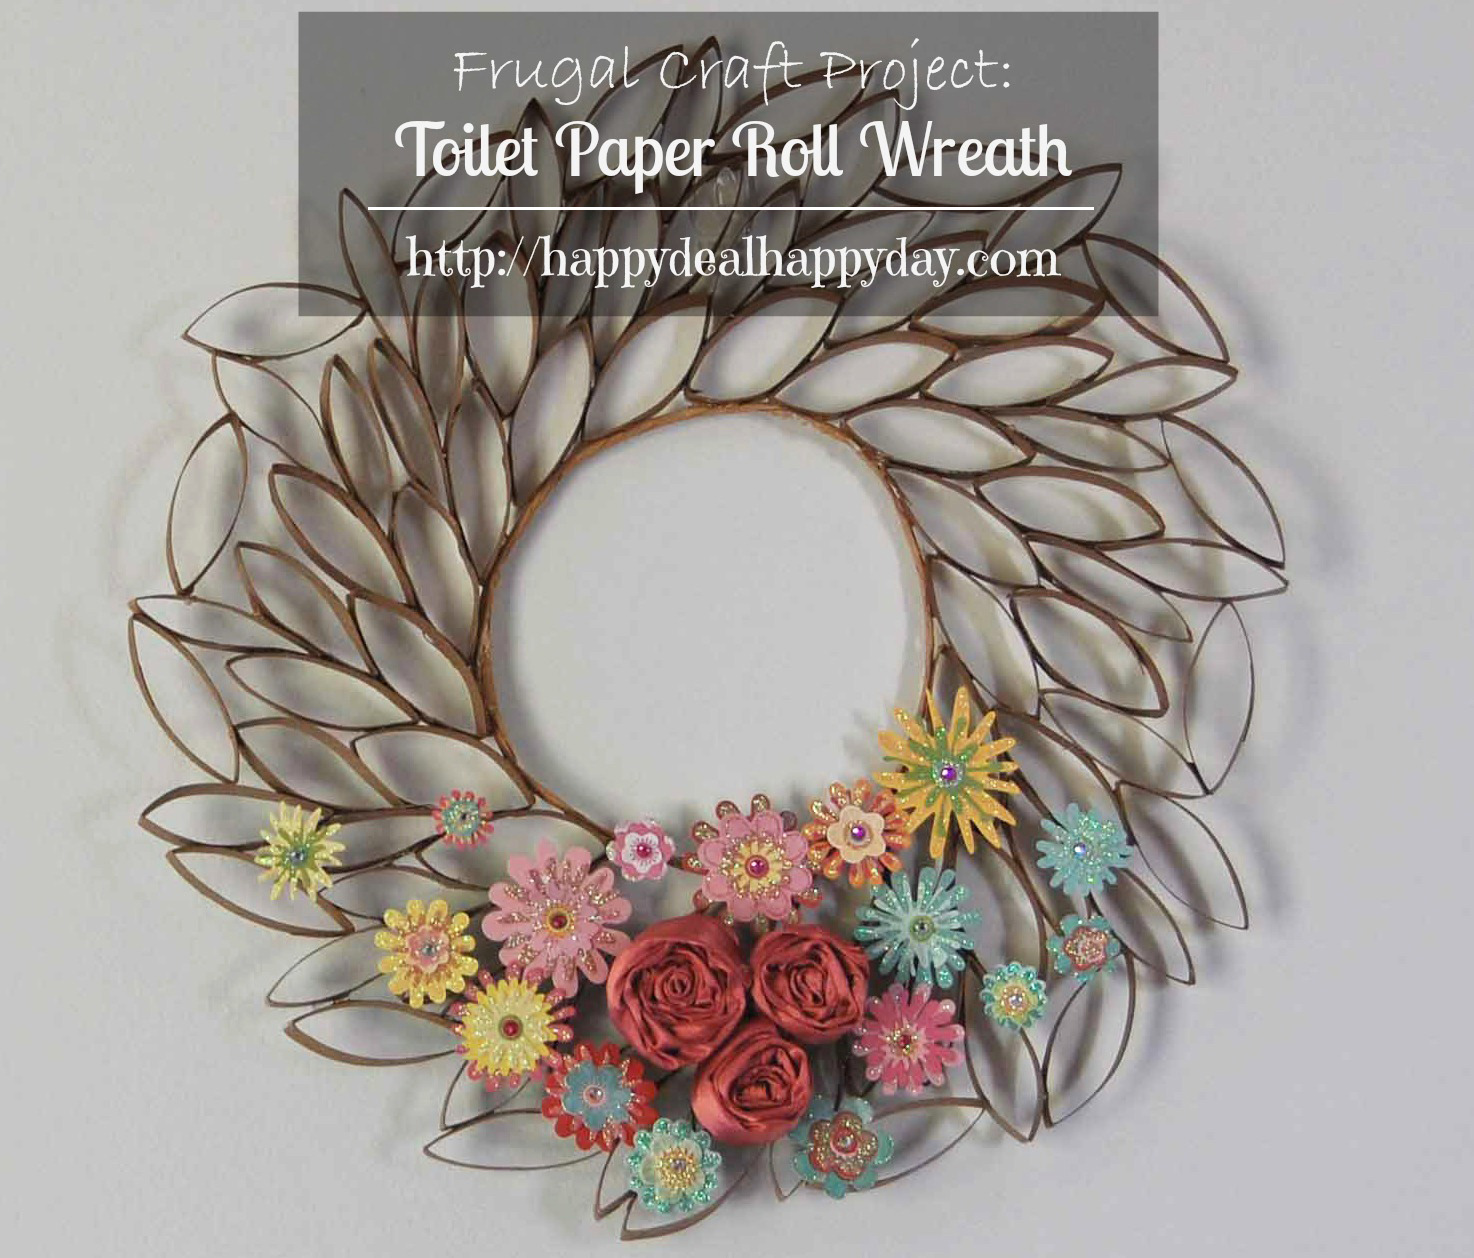 Toilet-paper-Roll-Wreath